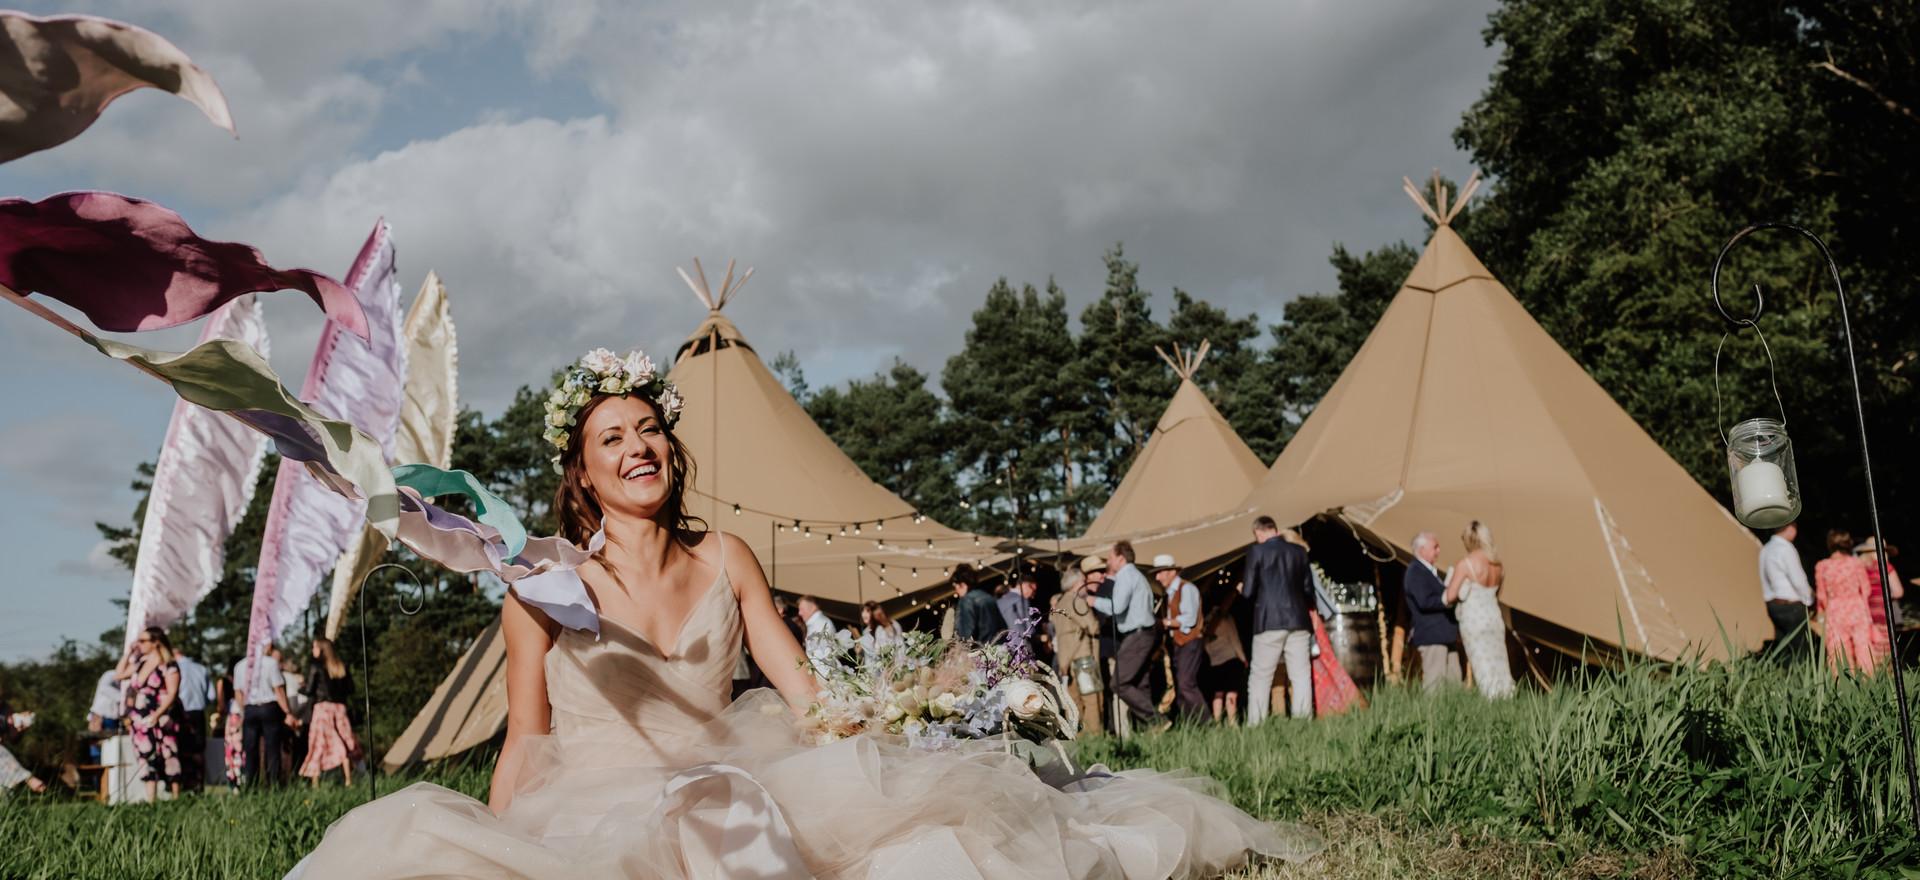 363 Lee Glasgow Wedding Photographer.jpg